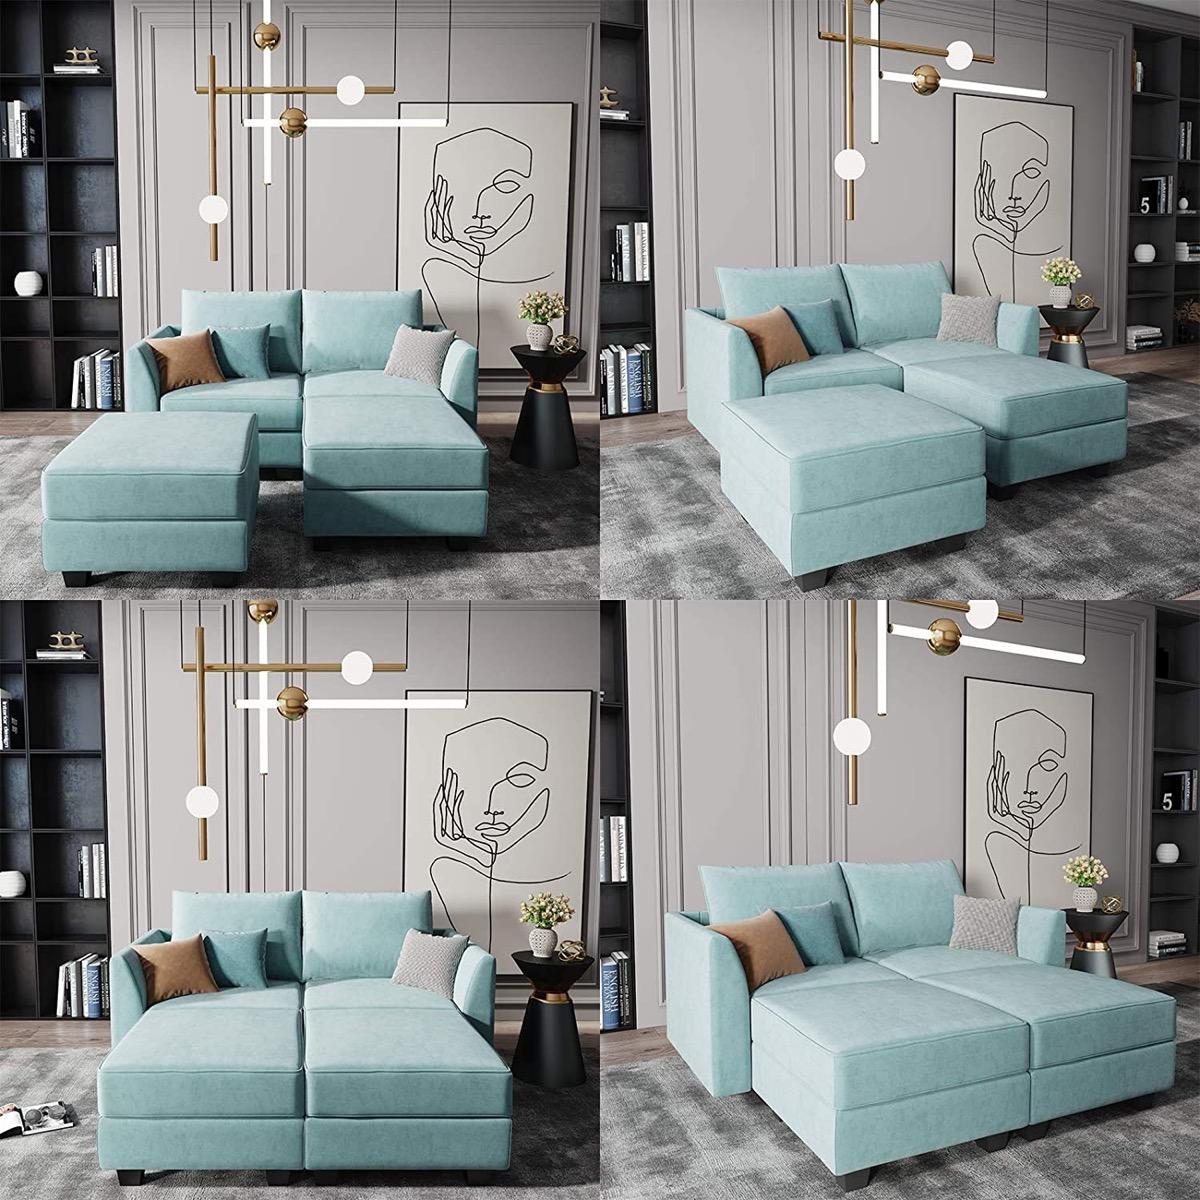 small-aqua-blue-modular-sofa-with-ottoman